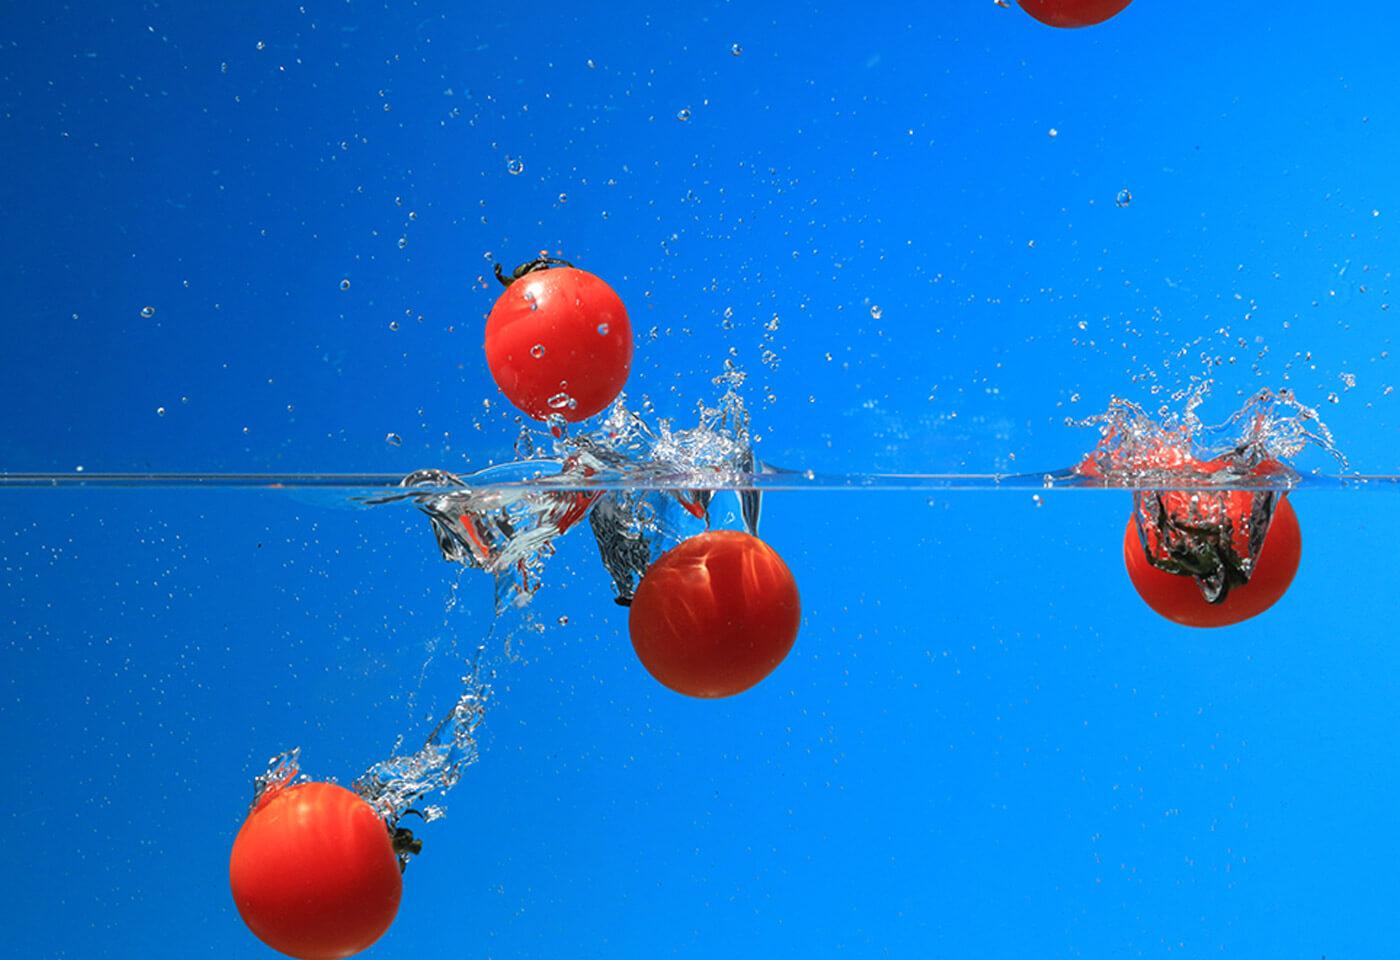 Bobbing tomatoes taken using Canon Speedlite 430EX III-RT flash